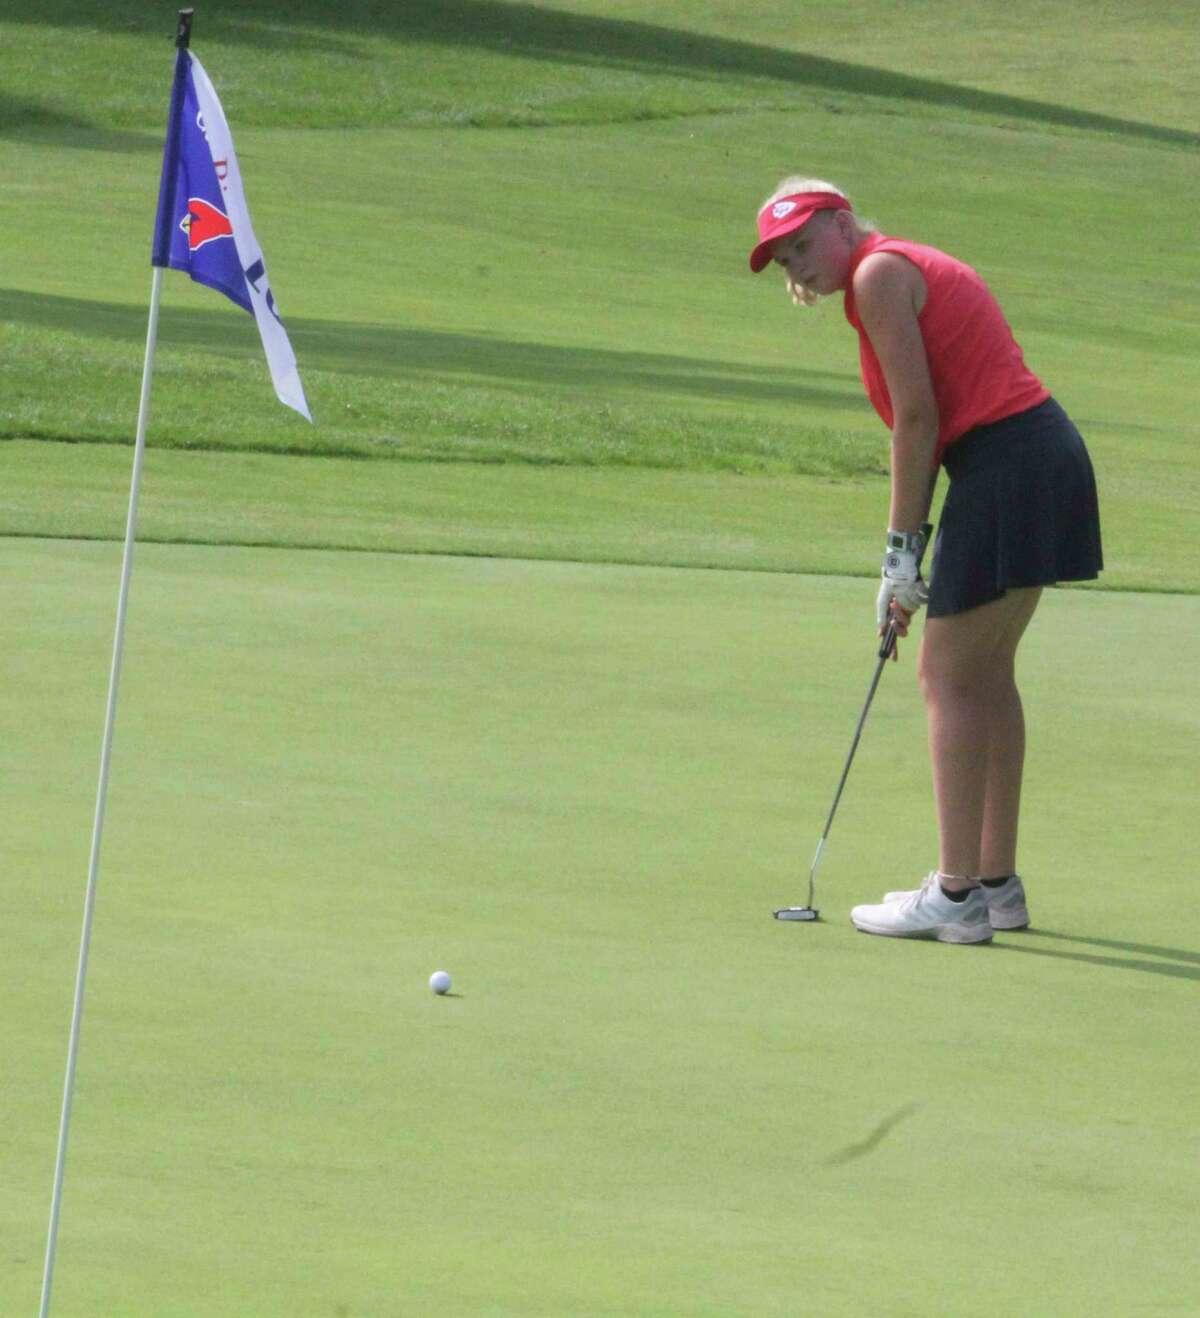 Chippewa Hills' Kerstin Stadtfeld, of Chippewa Hills, watches her putt at Katke Golf Course during Friday's Cardinal Invitational. (Pioneer photo/John Raffel)